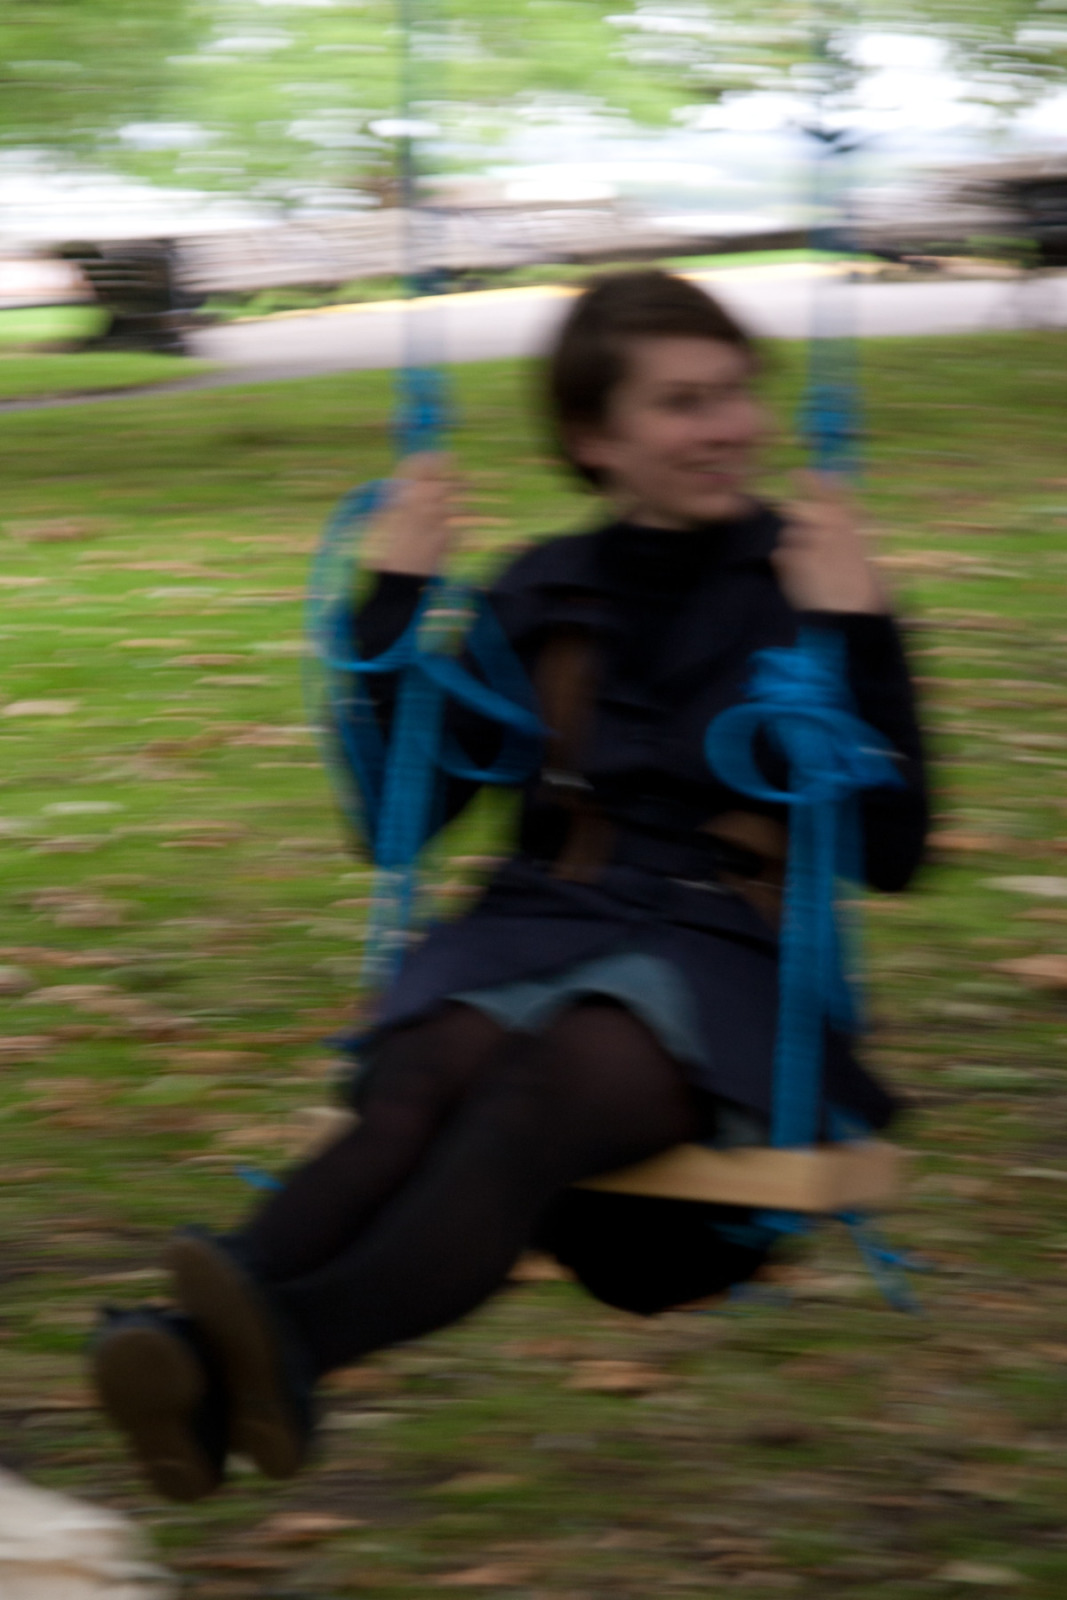 Swing: Flux and Reflux, 2012, Park in Progress (PIP), WEYA, Nottingham, UK